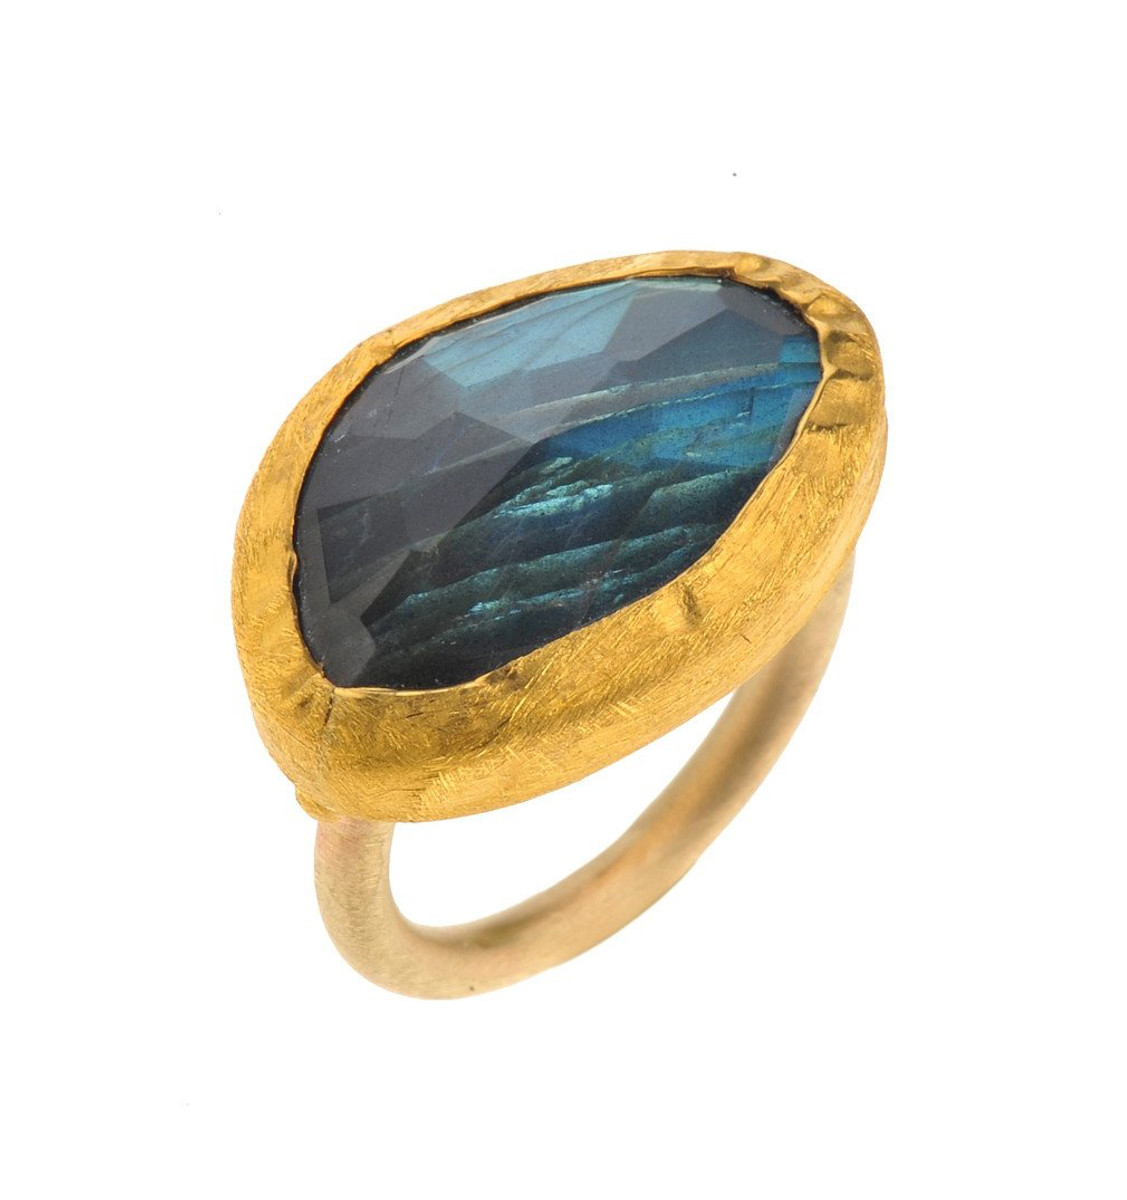 Moonshadow Labradorite Gold Ring by Nava Zahavi  - New Arrival